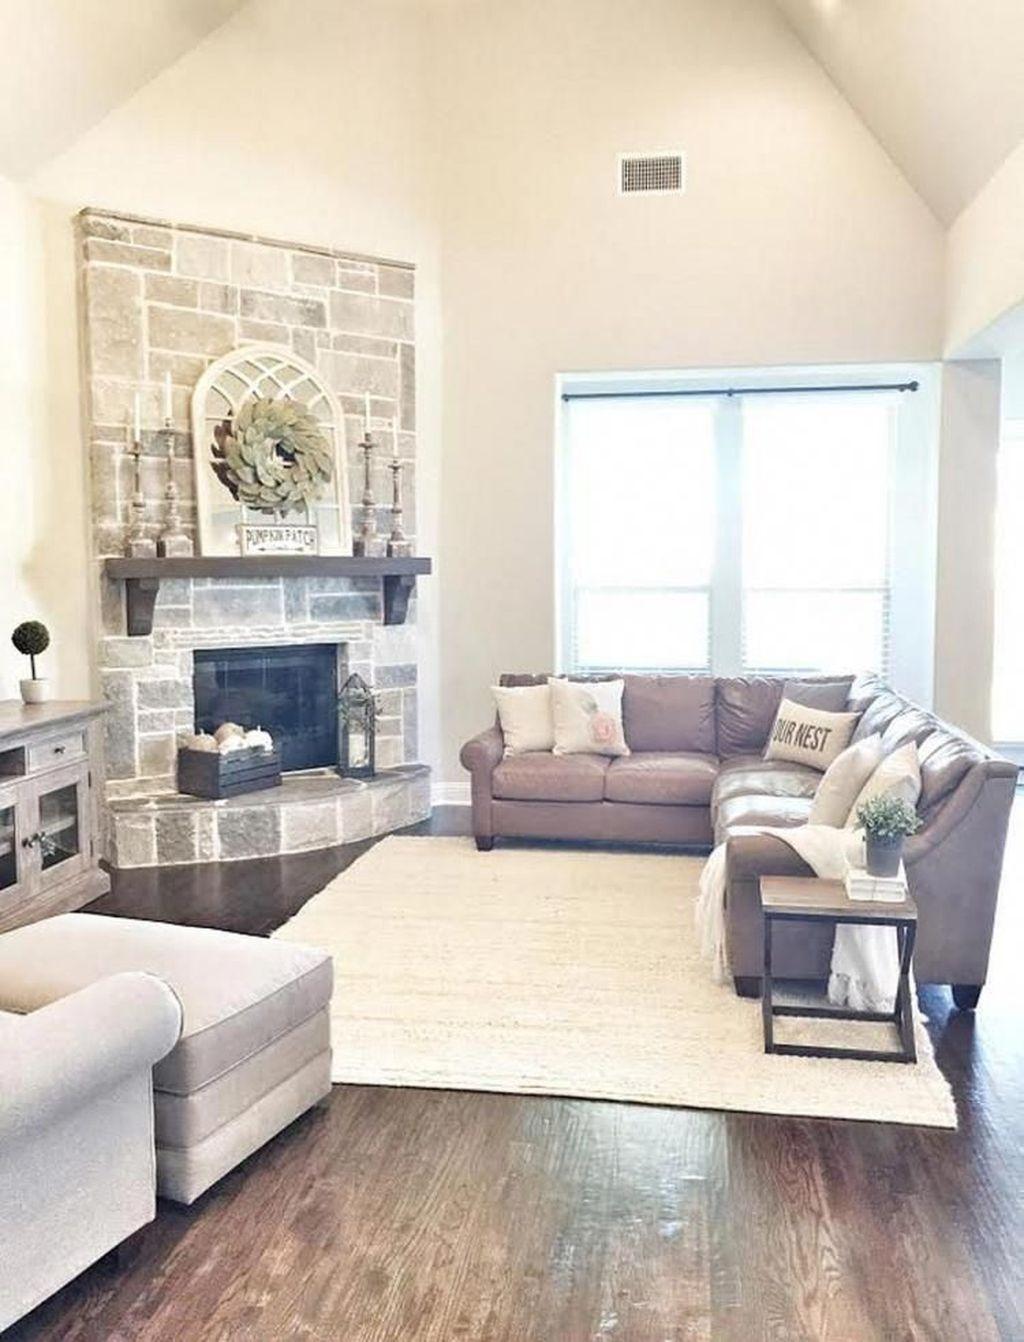 39 Stunning Corner Fireplace Design For Living Room Magzhouse